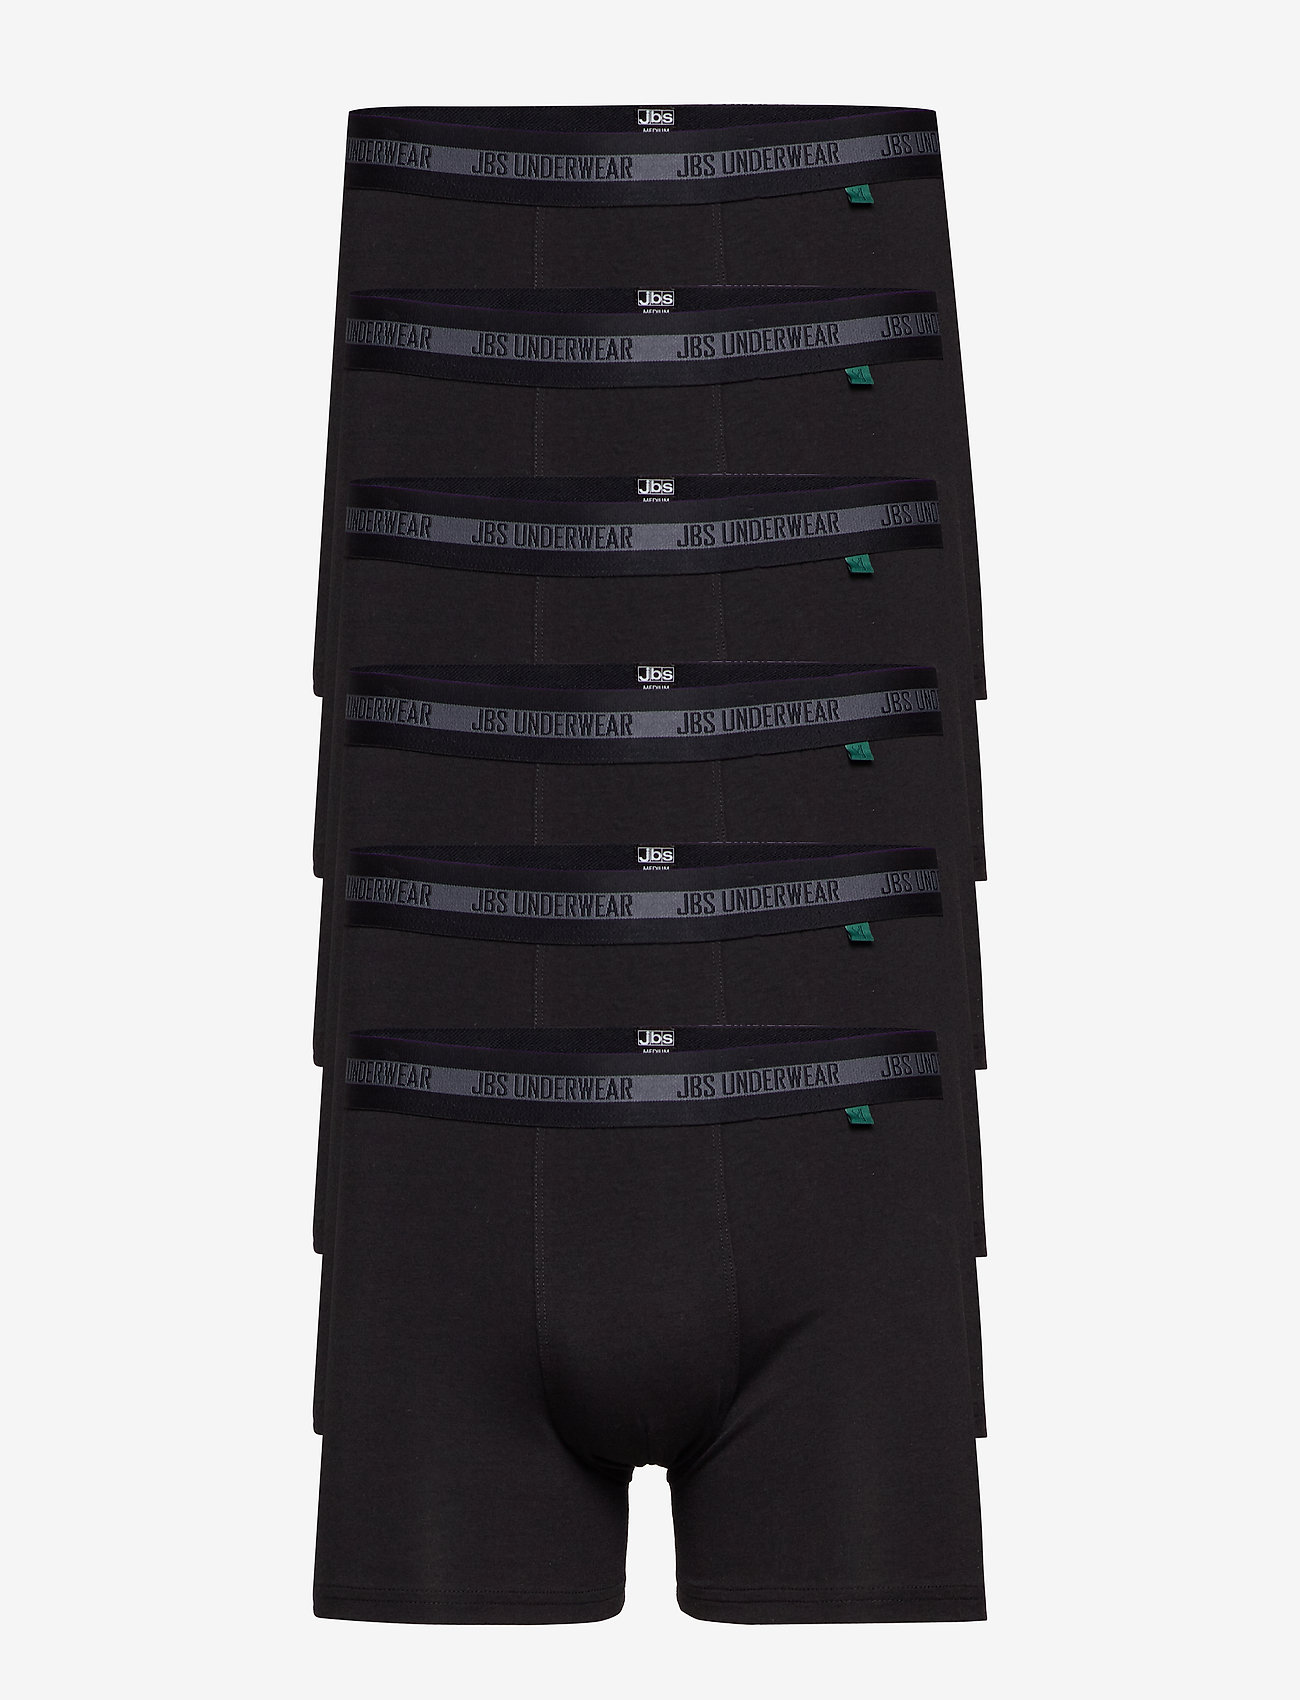 JBS - JBS 6-pack tights bamboo - undertøy - svart